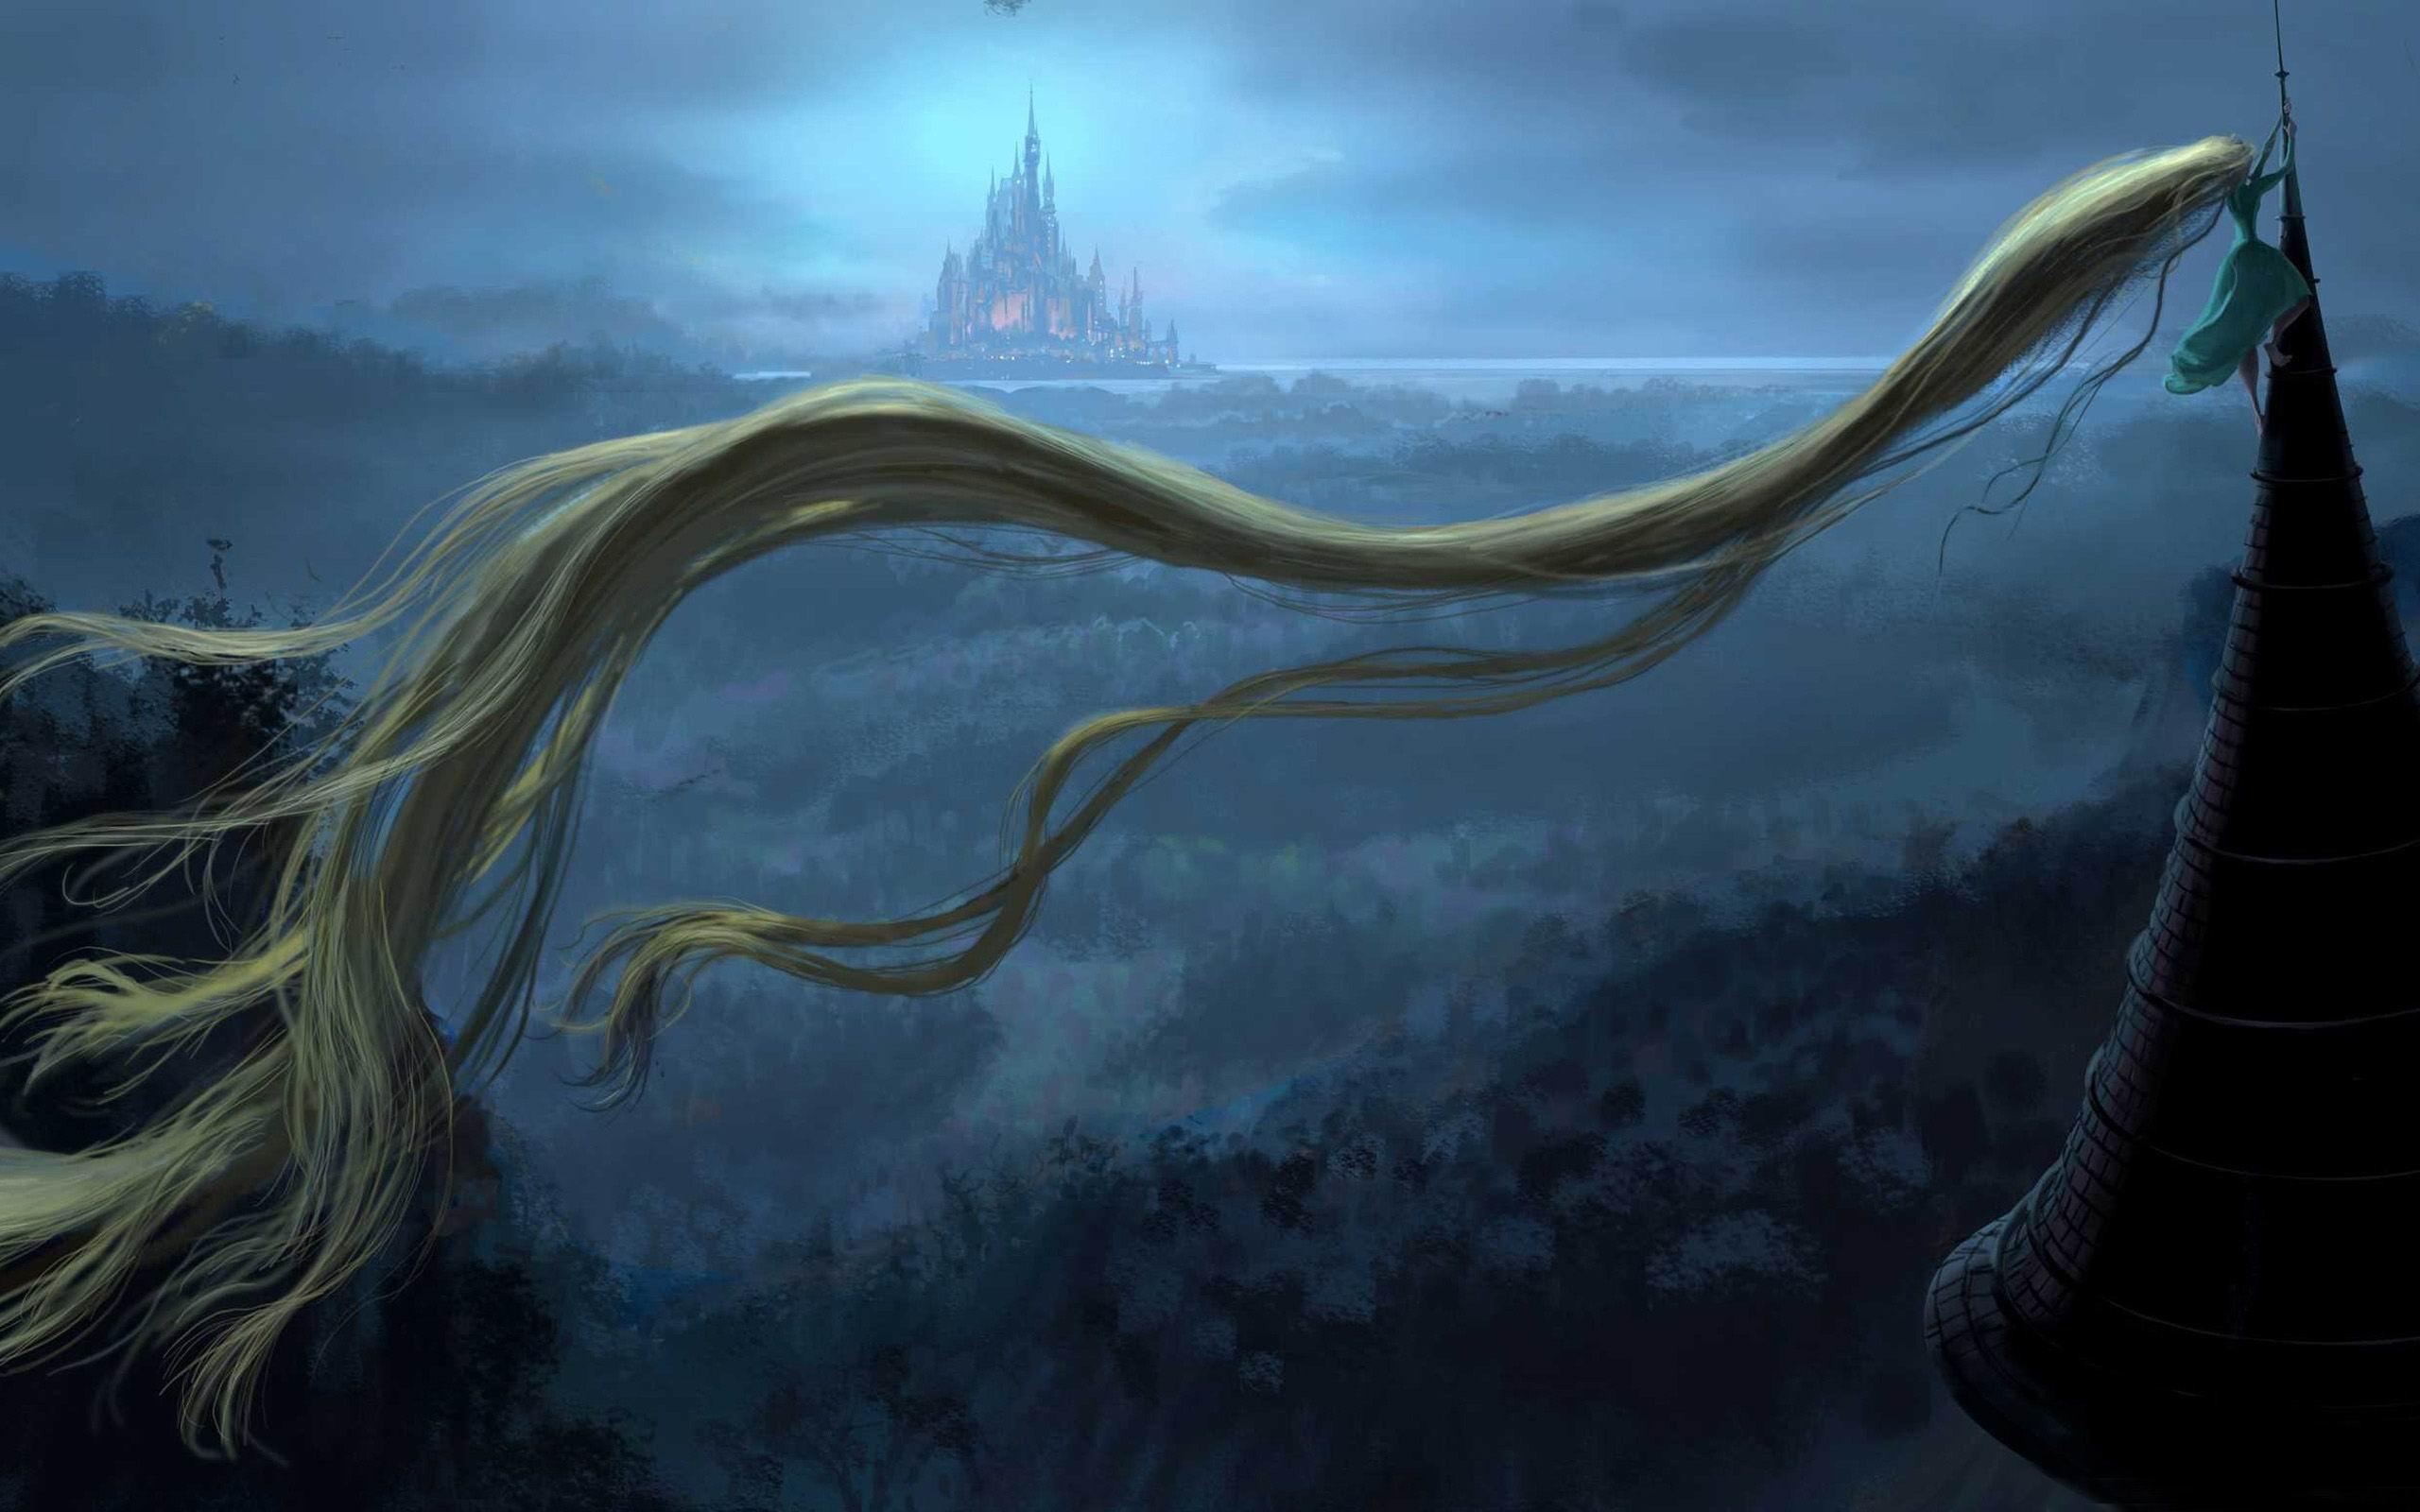 Rapunzel tower world of fantasy art design hd wallpaper preview - Tangled tower wallpaper ...